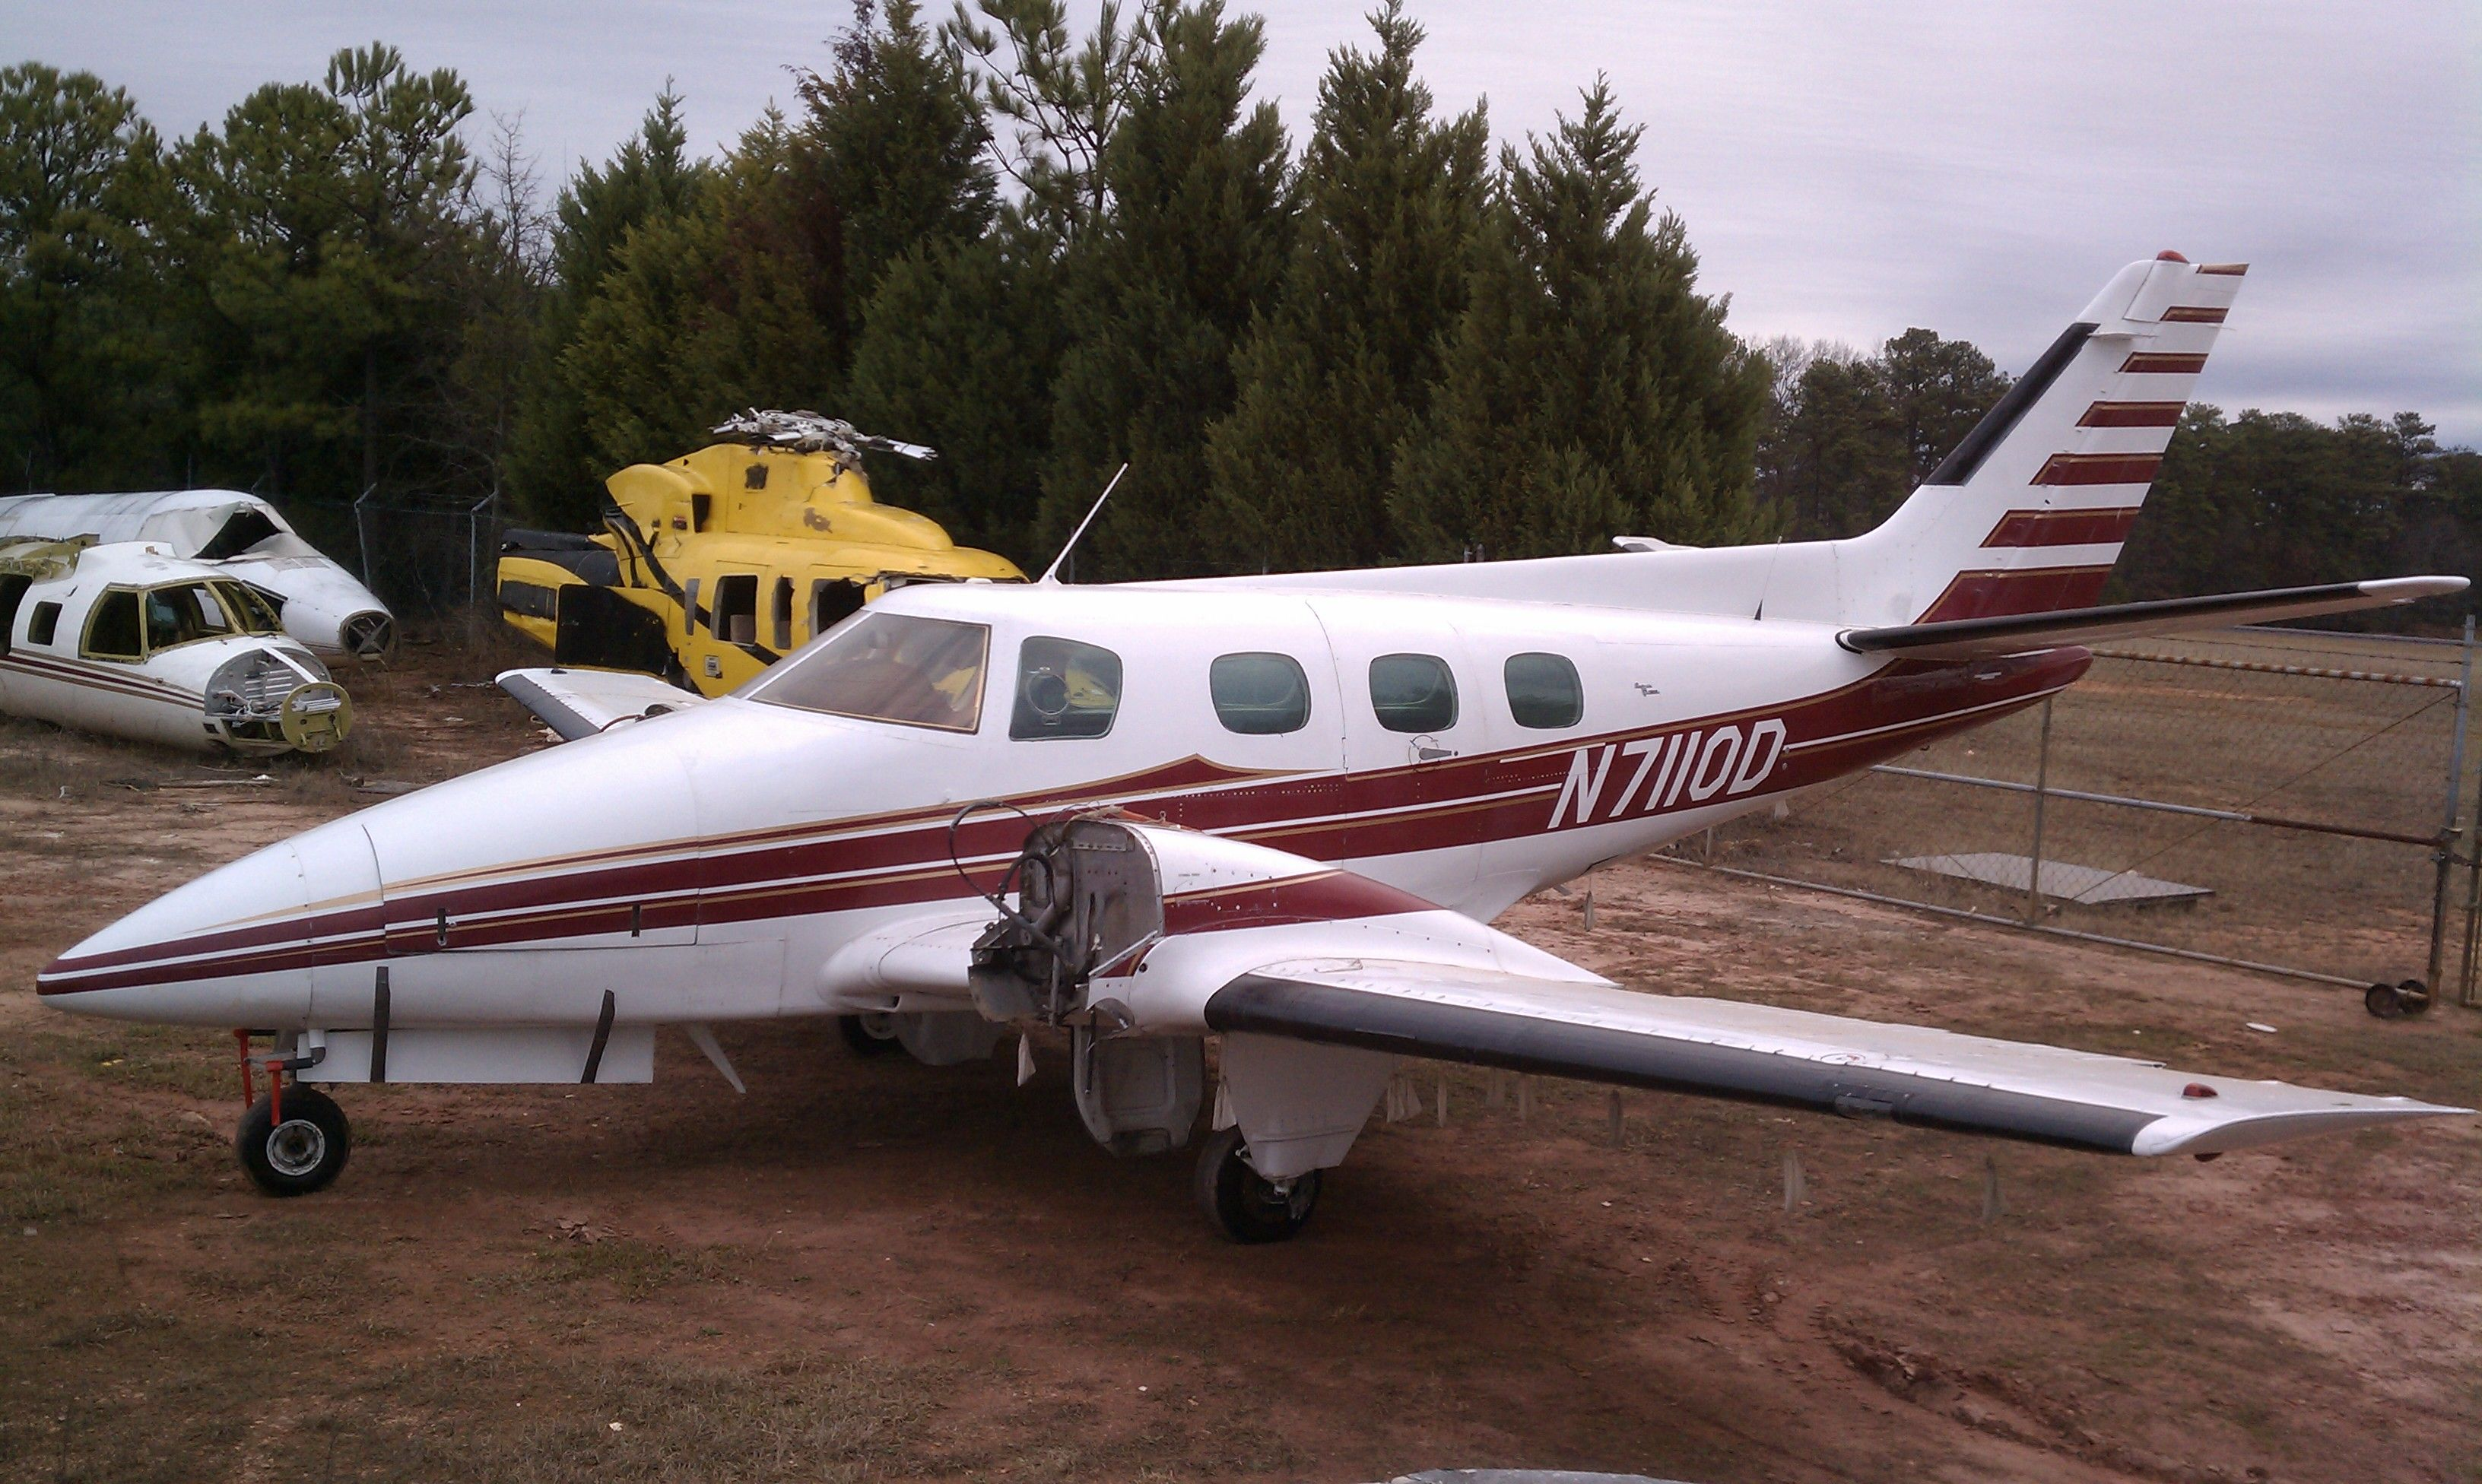 Airframes - Here at Atlanta Air Exchange, we have a large